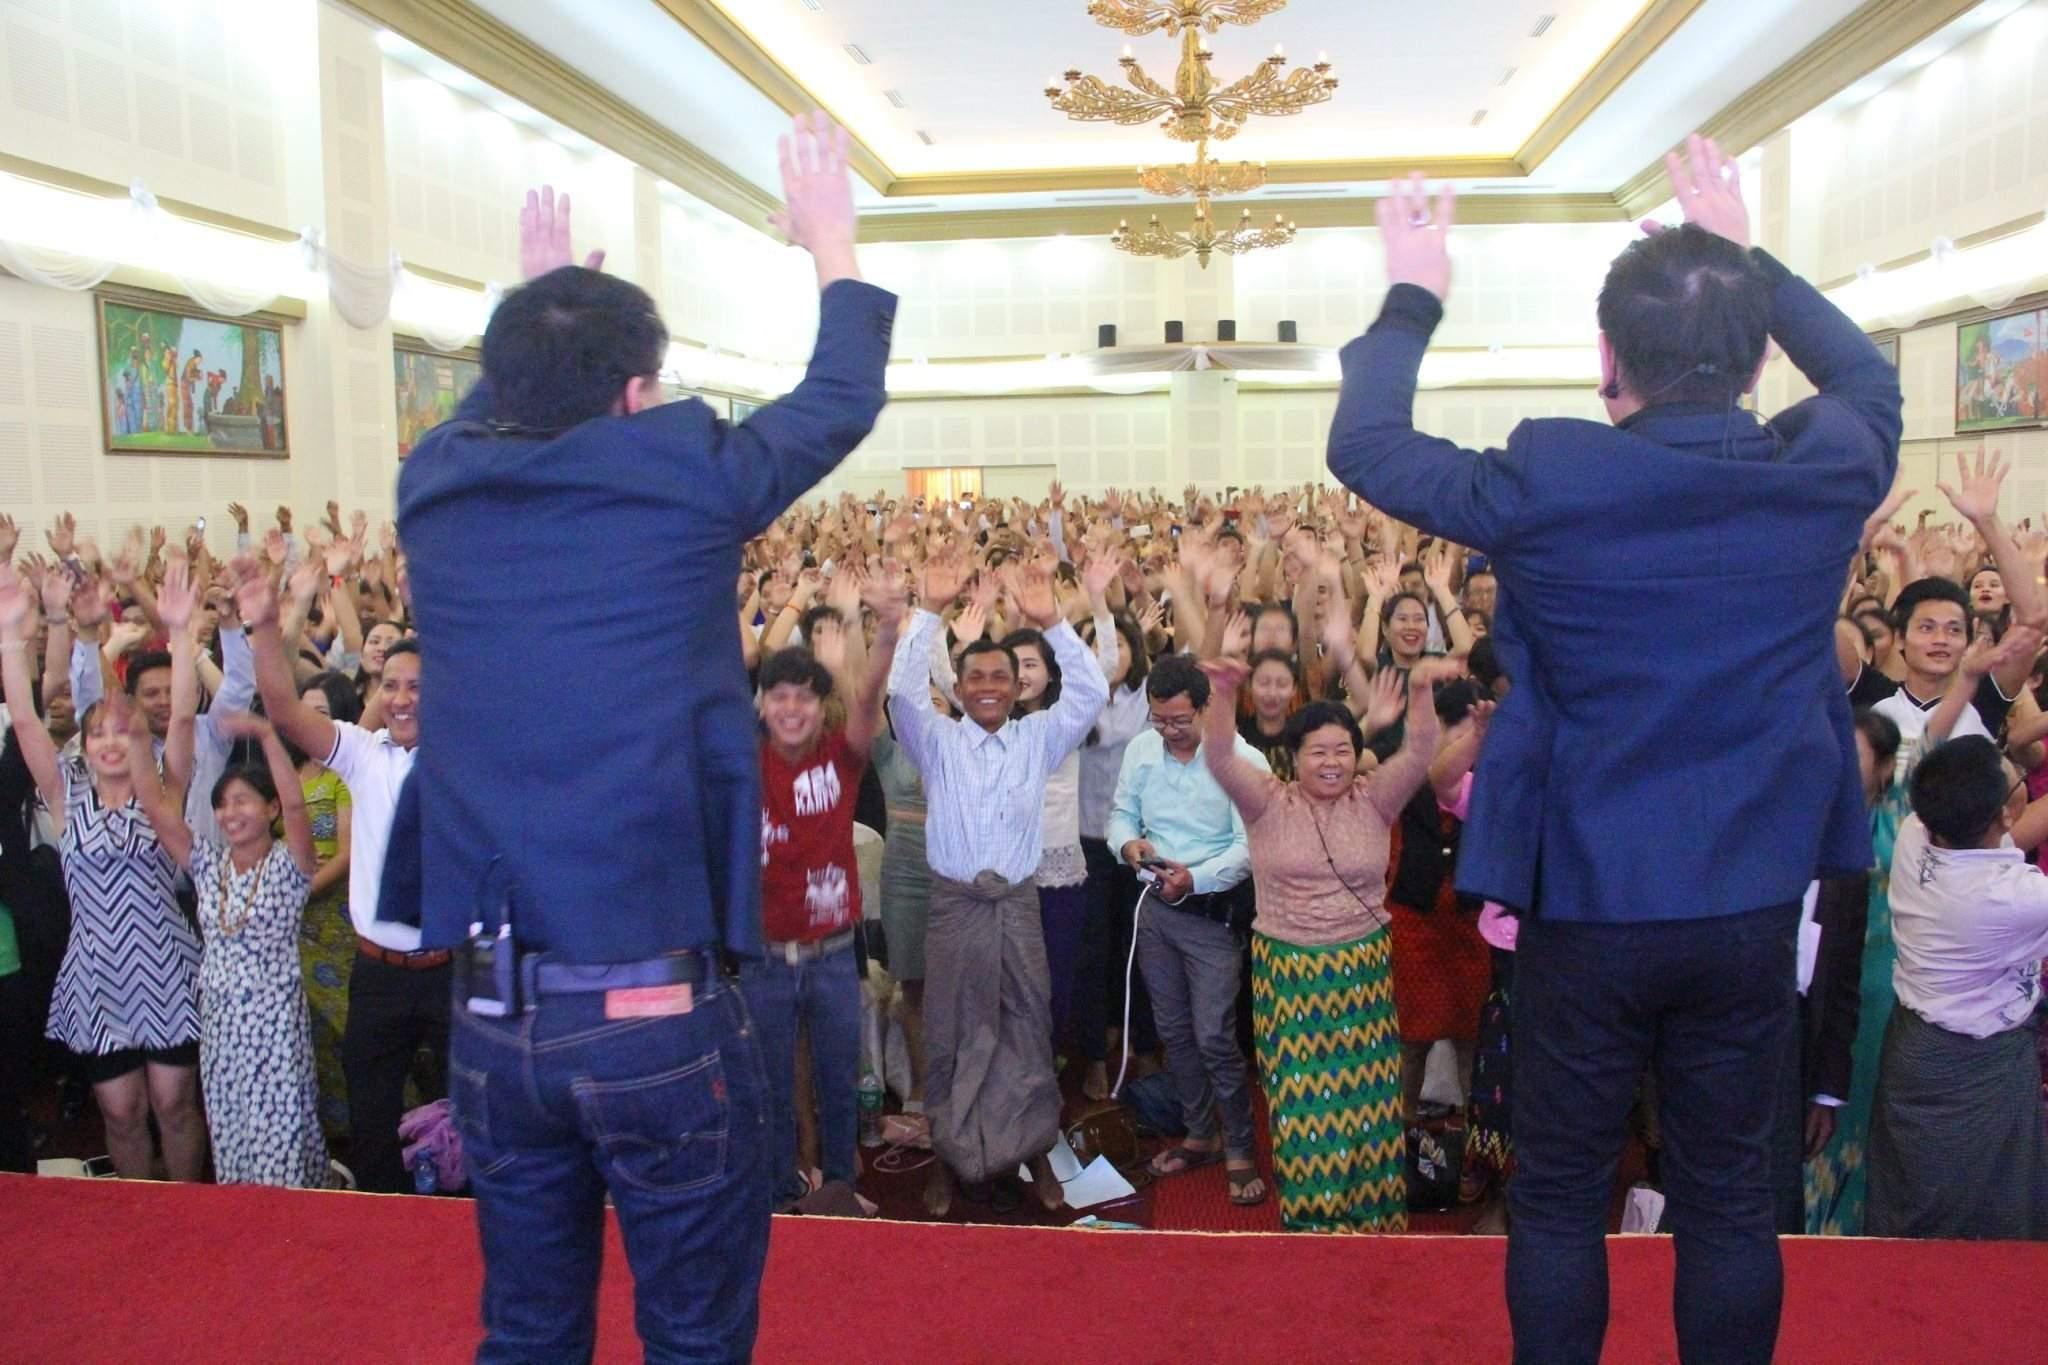 SUCCESSMORE Inspiration ครั้งที่ 19 ประเทศเมียนมา (4)